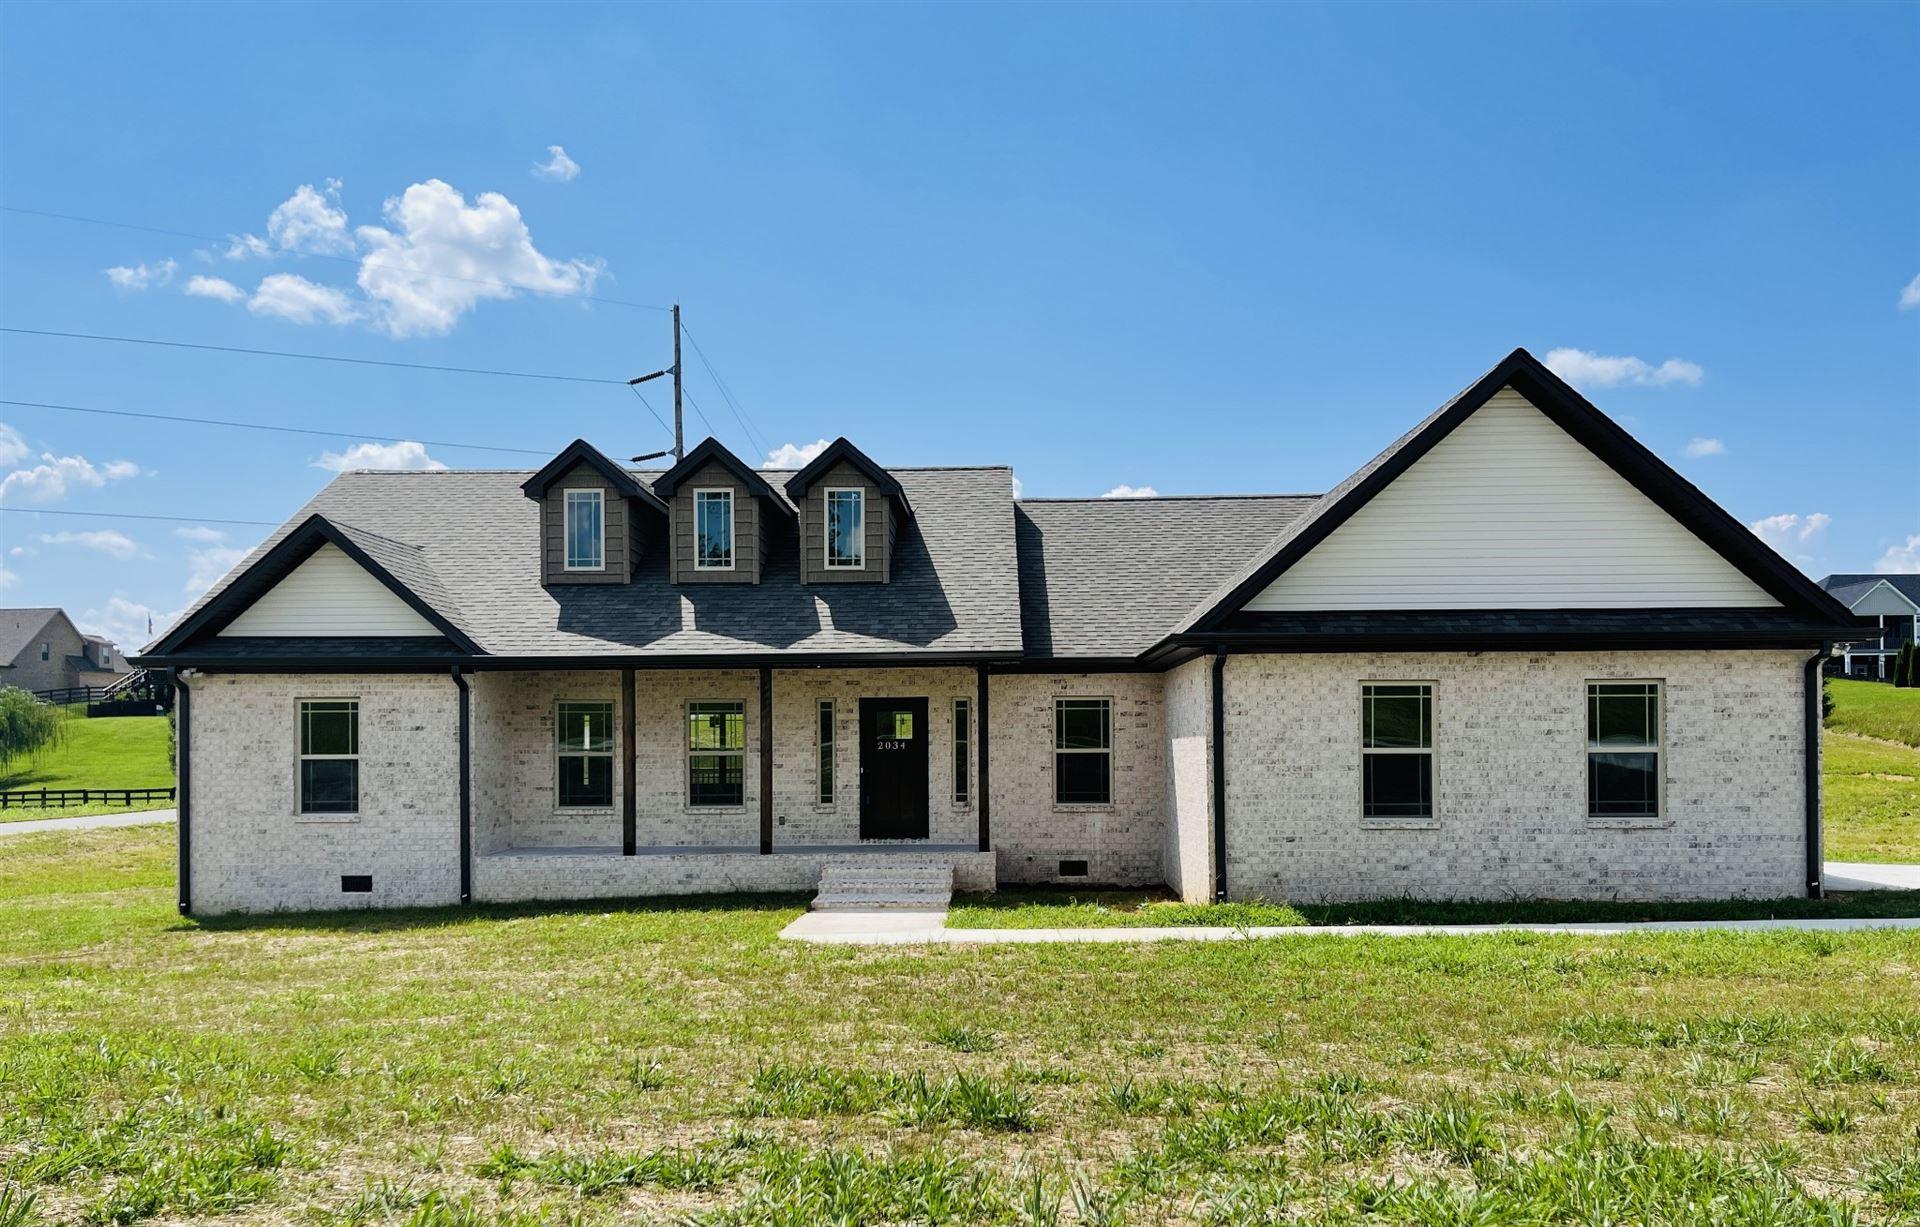 2034 Foster Cir, Cookeville, TN 38501 - MLS#: 2257387